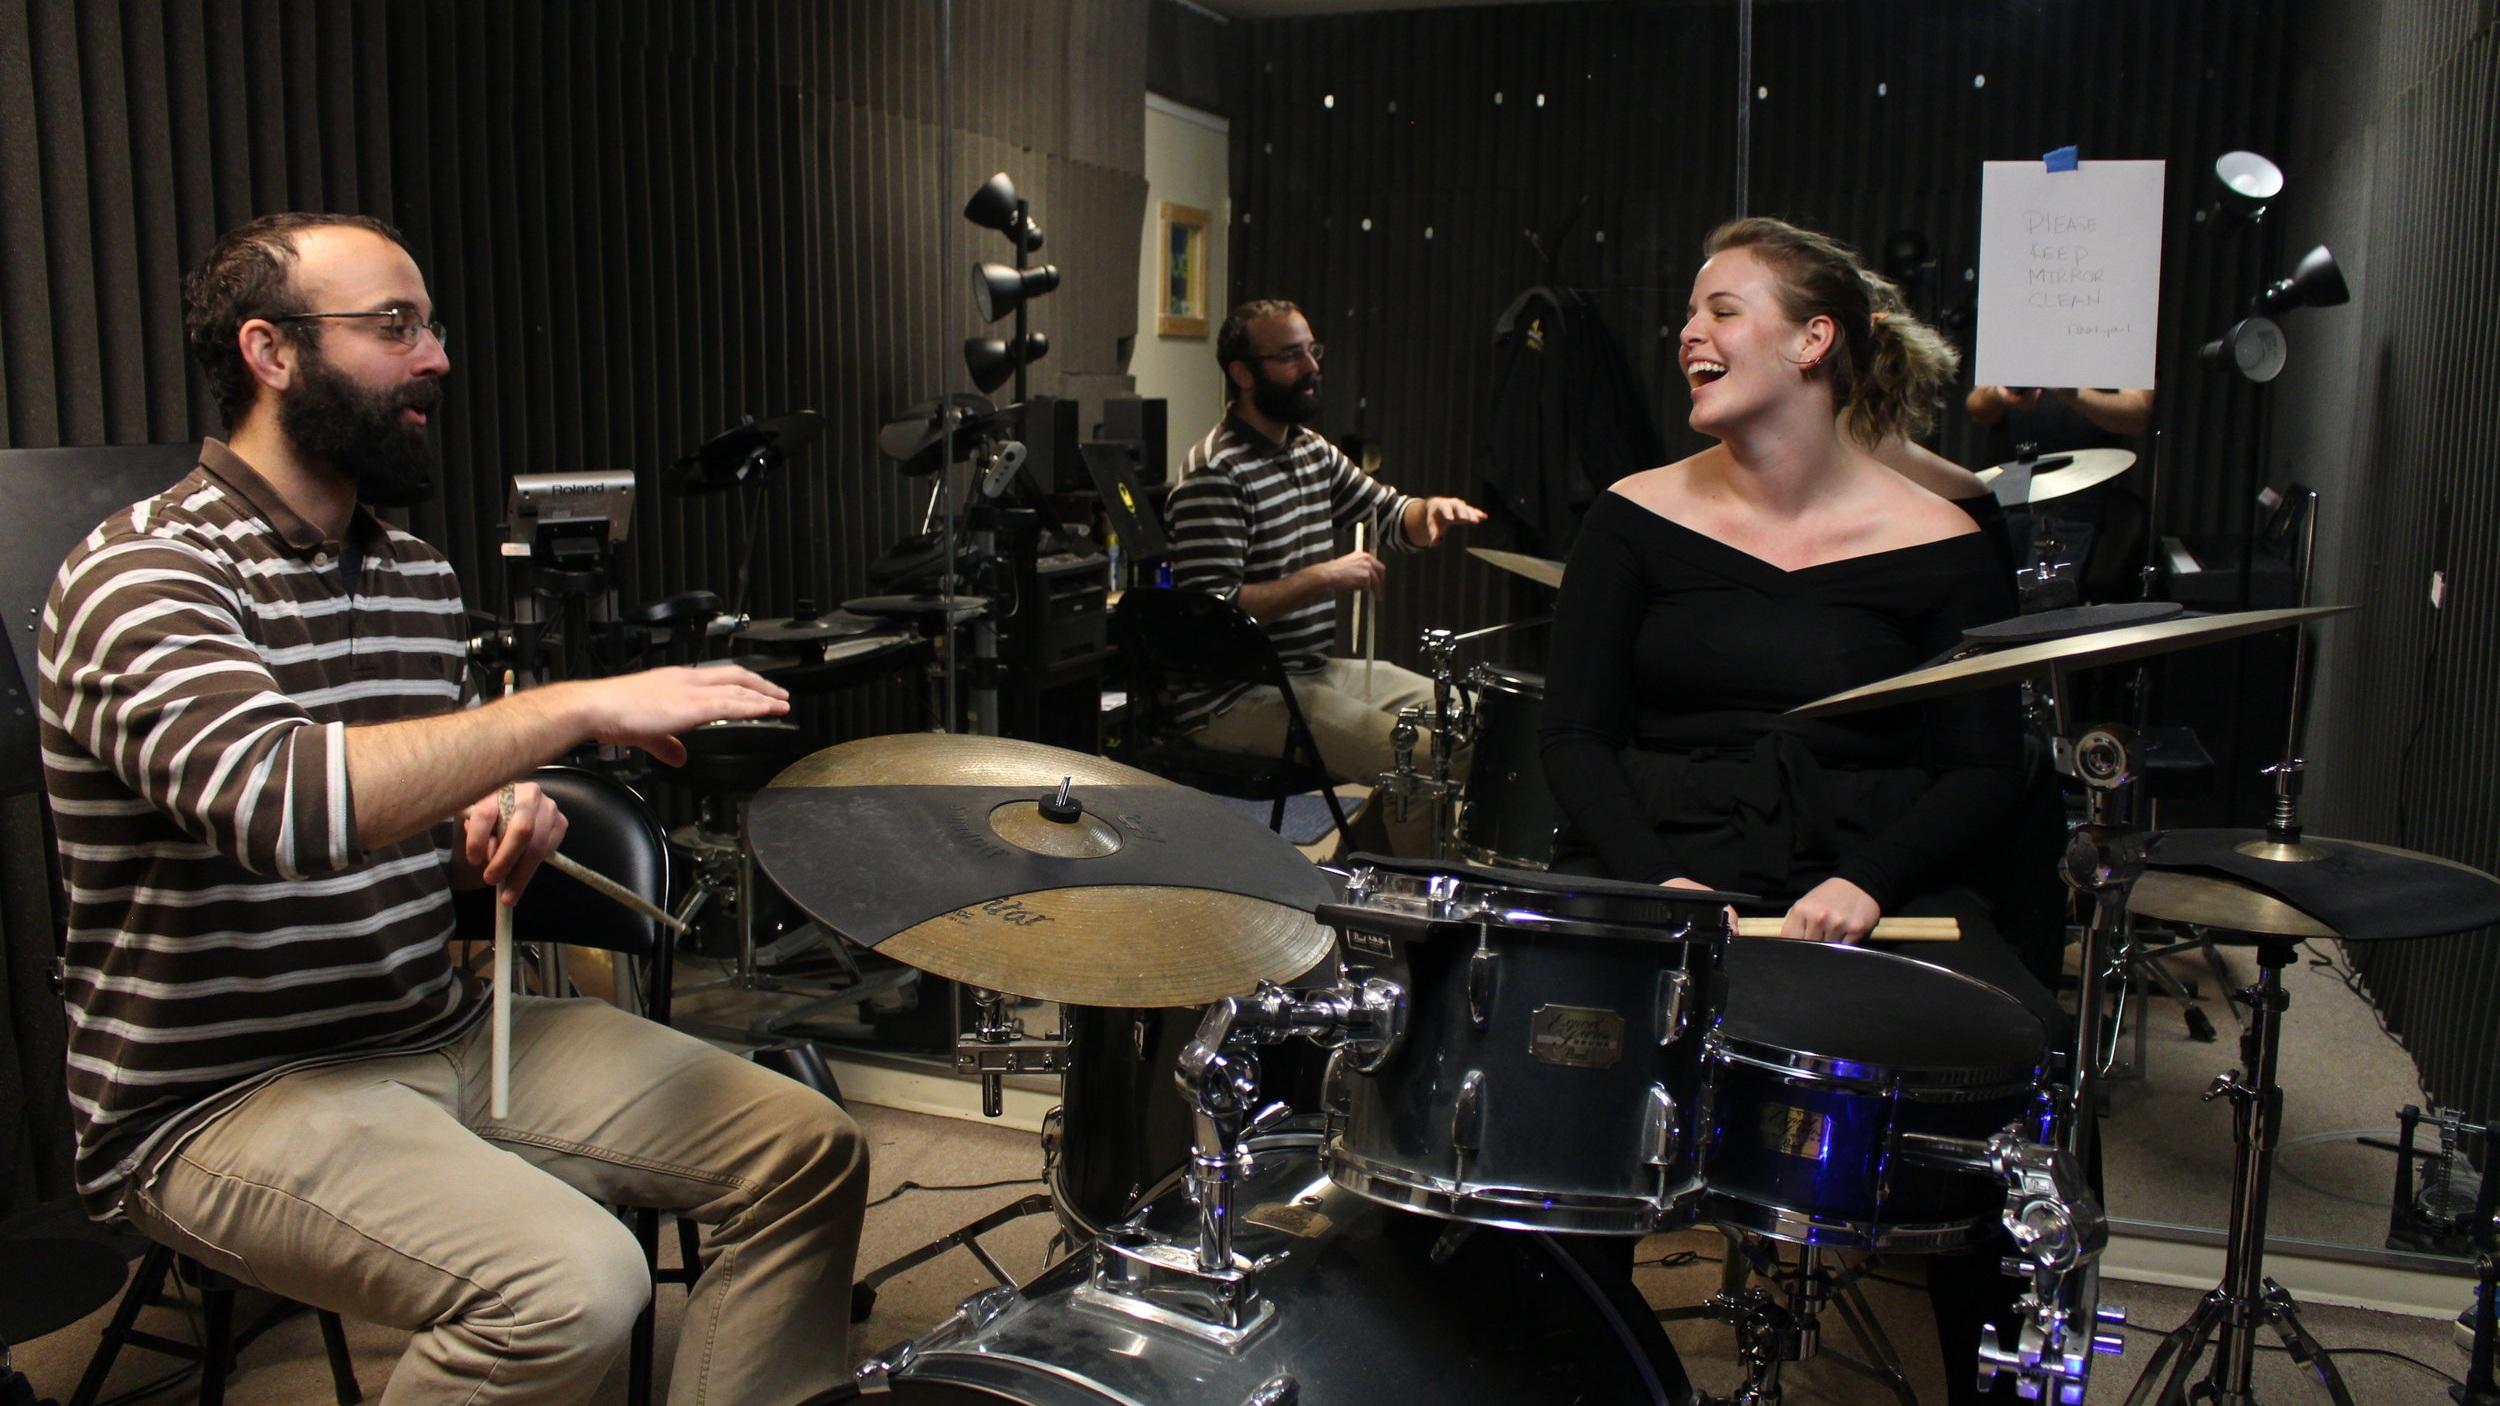 Meet Drum Music Instructor: Glen Wallace 2 - Burlington Music Dojo